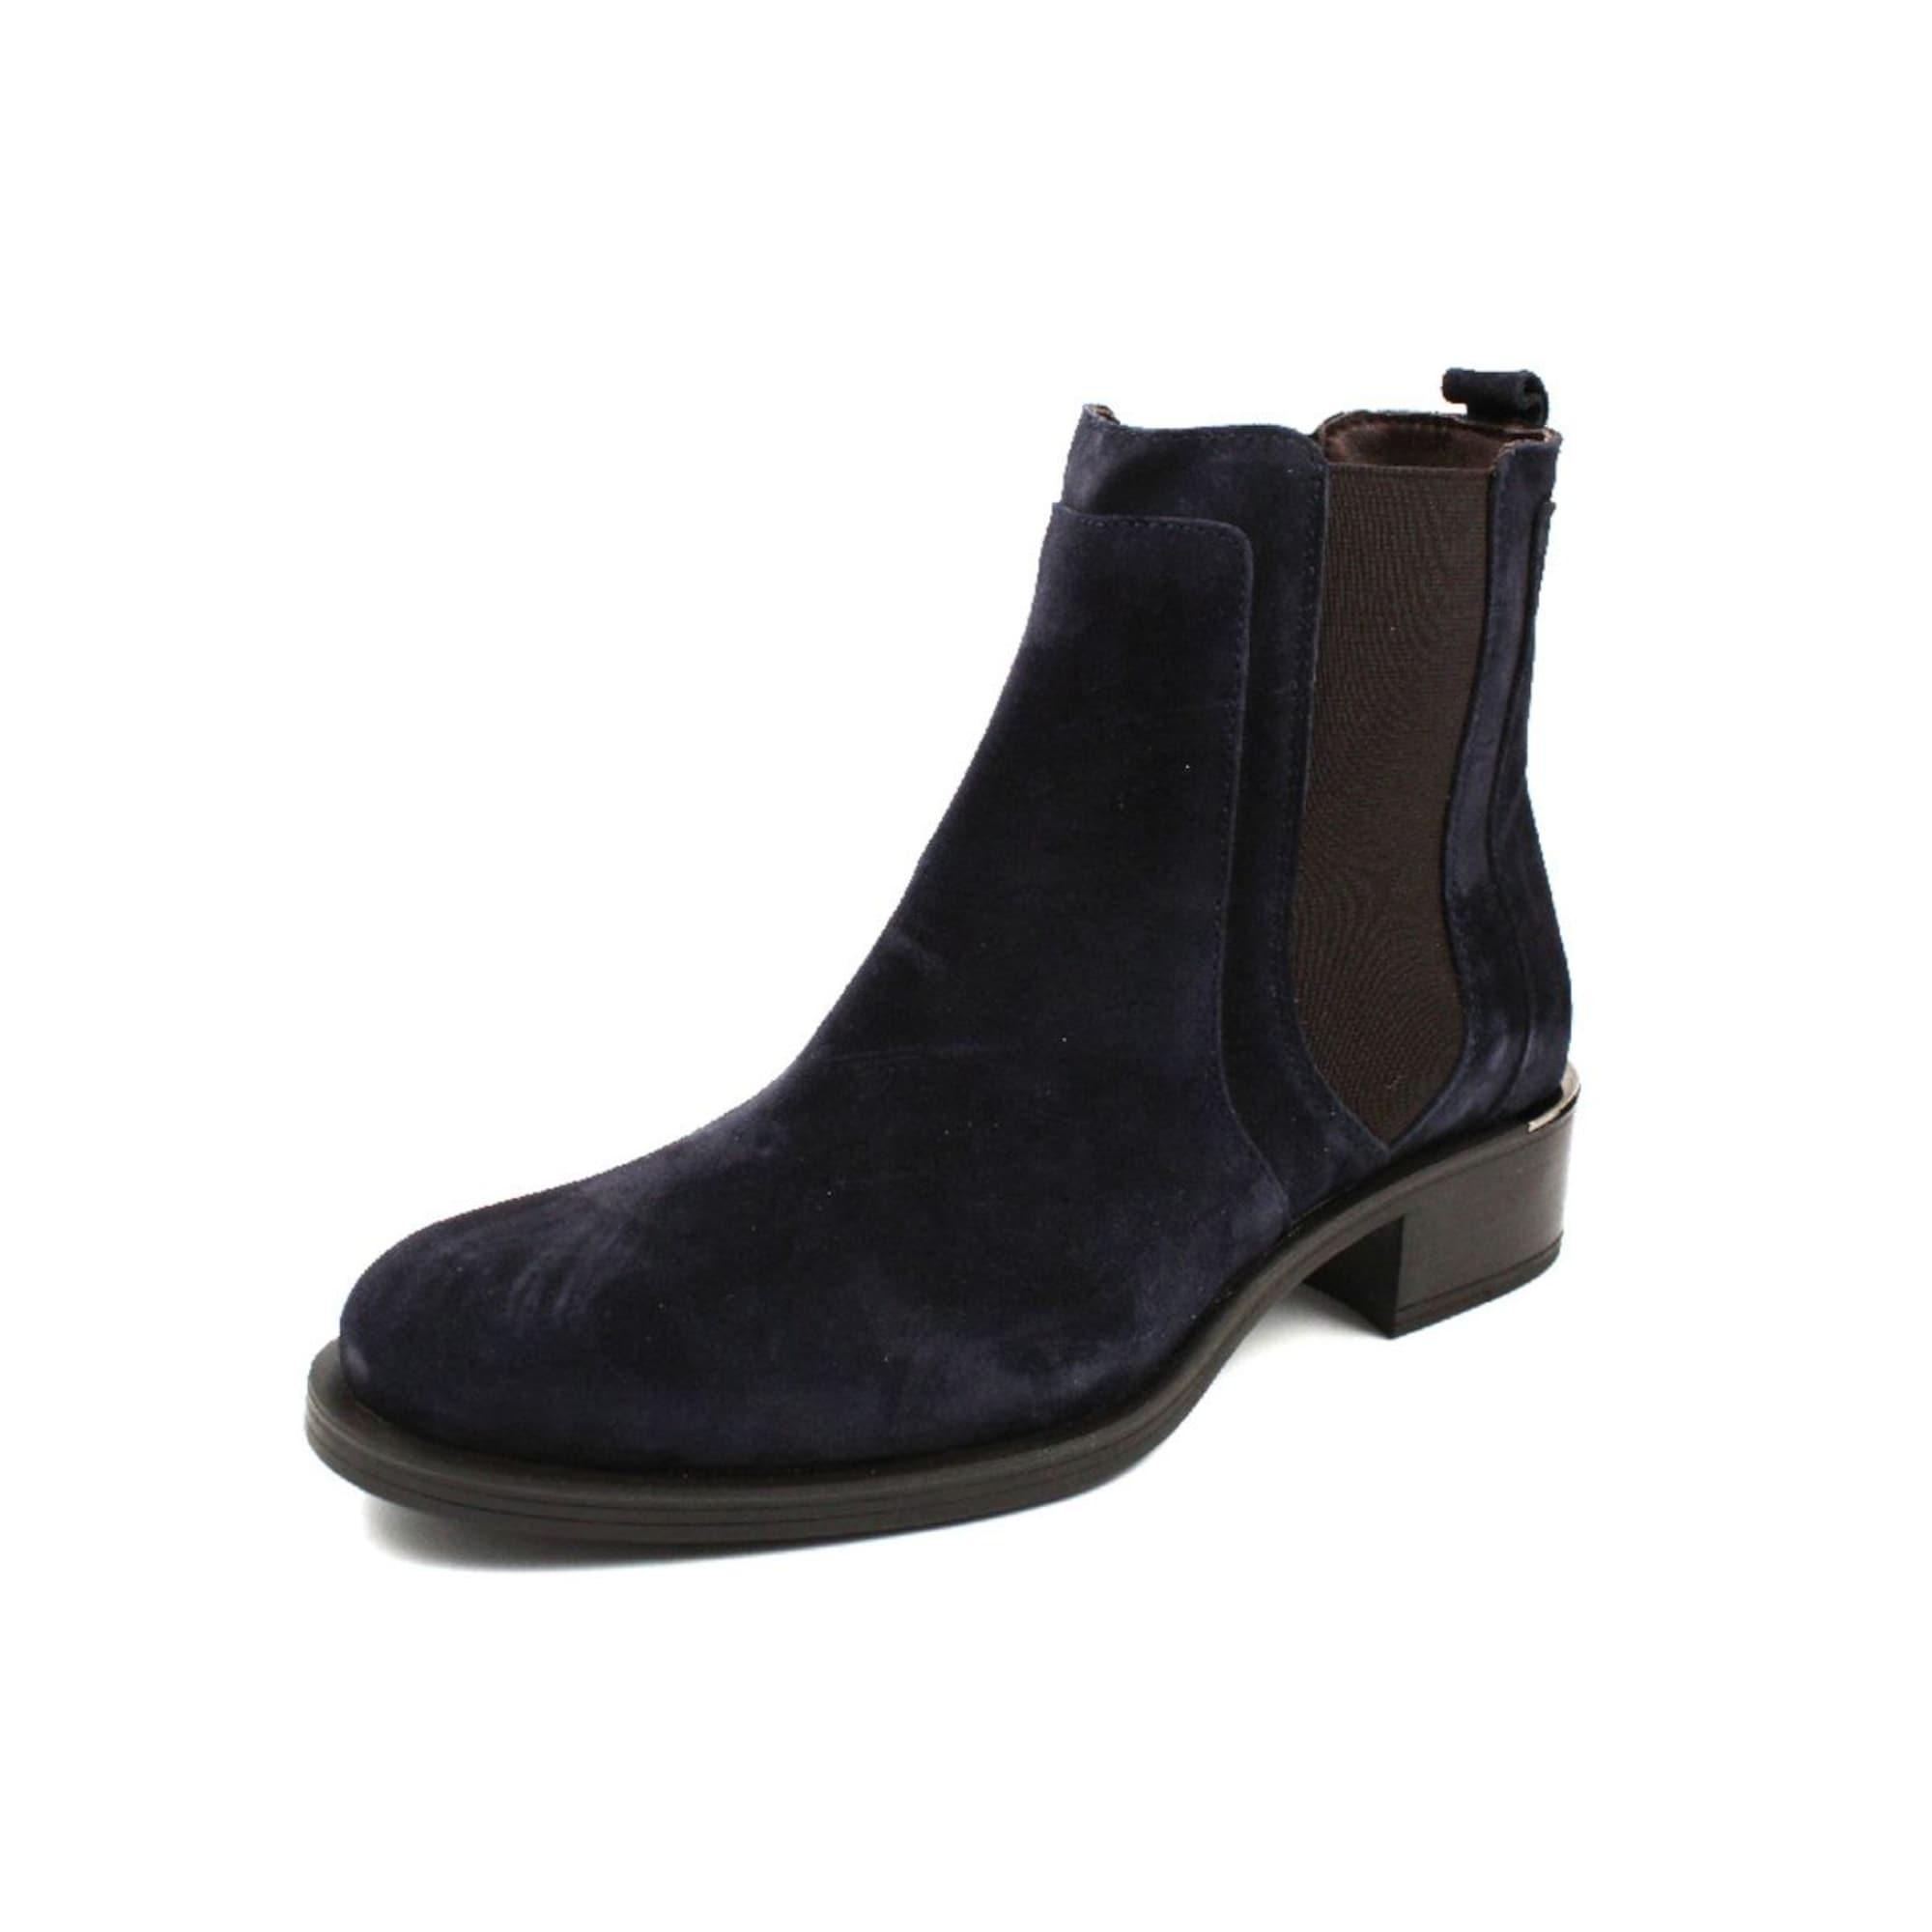 Stiefel | Schuhe > Stiefel | Alpe